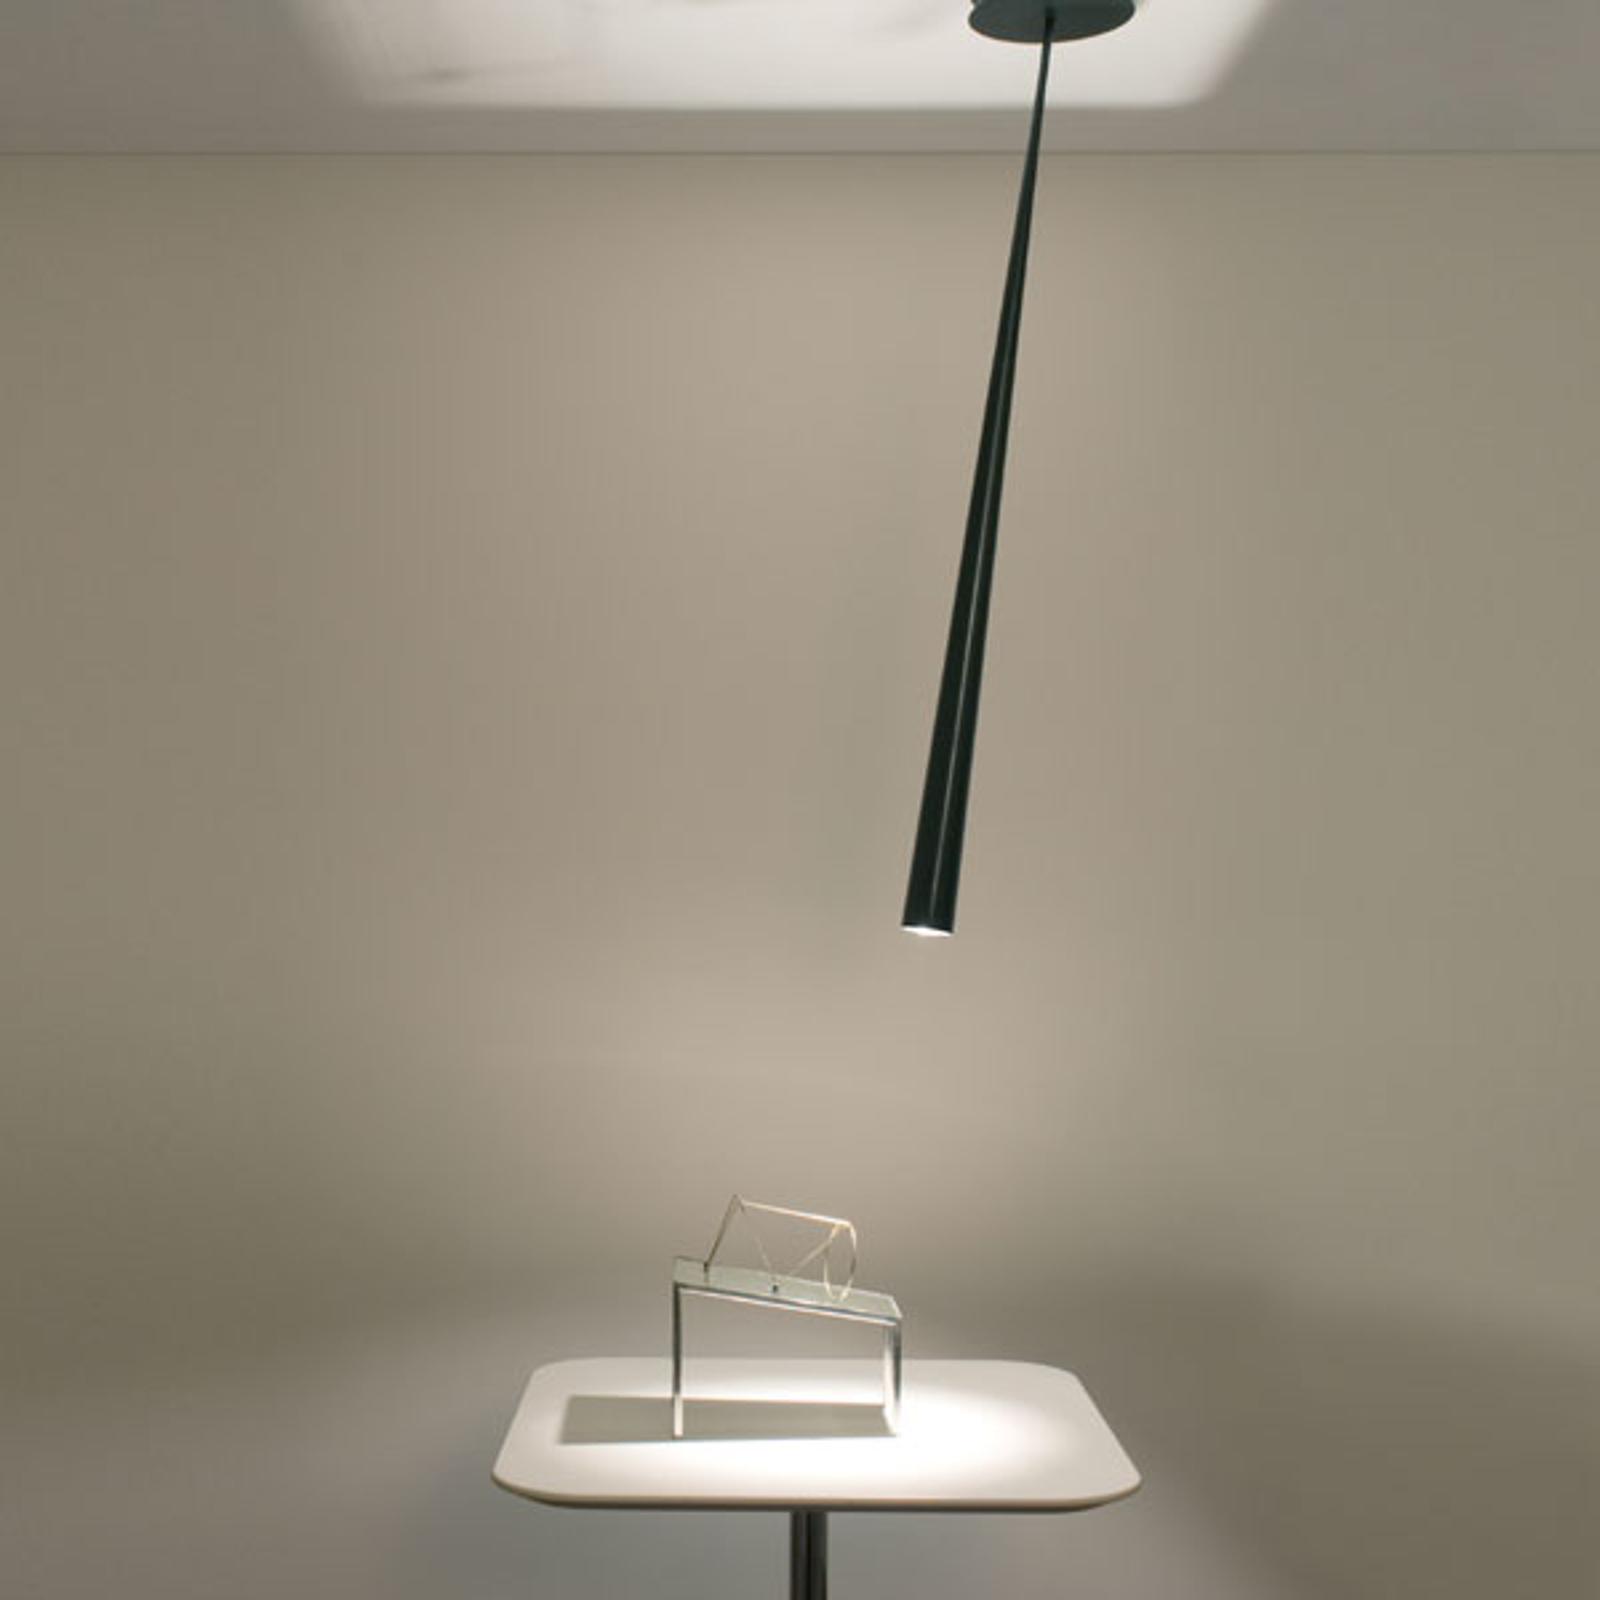 Designer-hengelampe Drink, svart, 127 cm